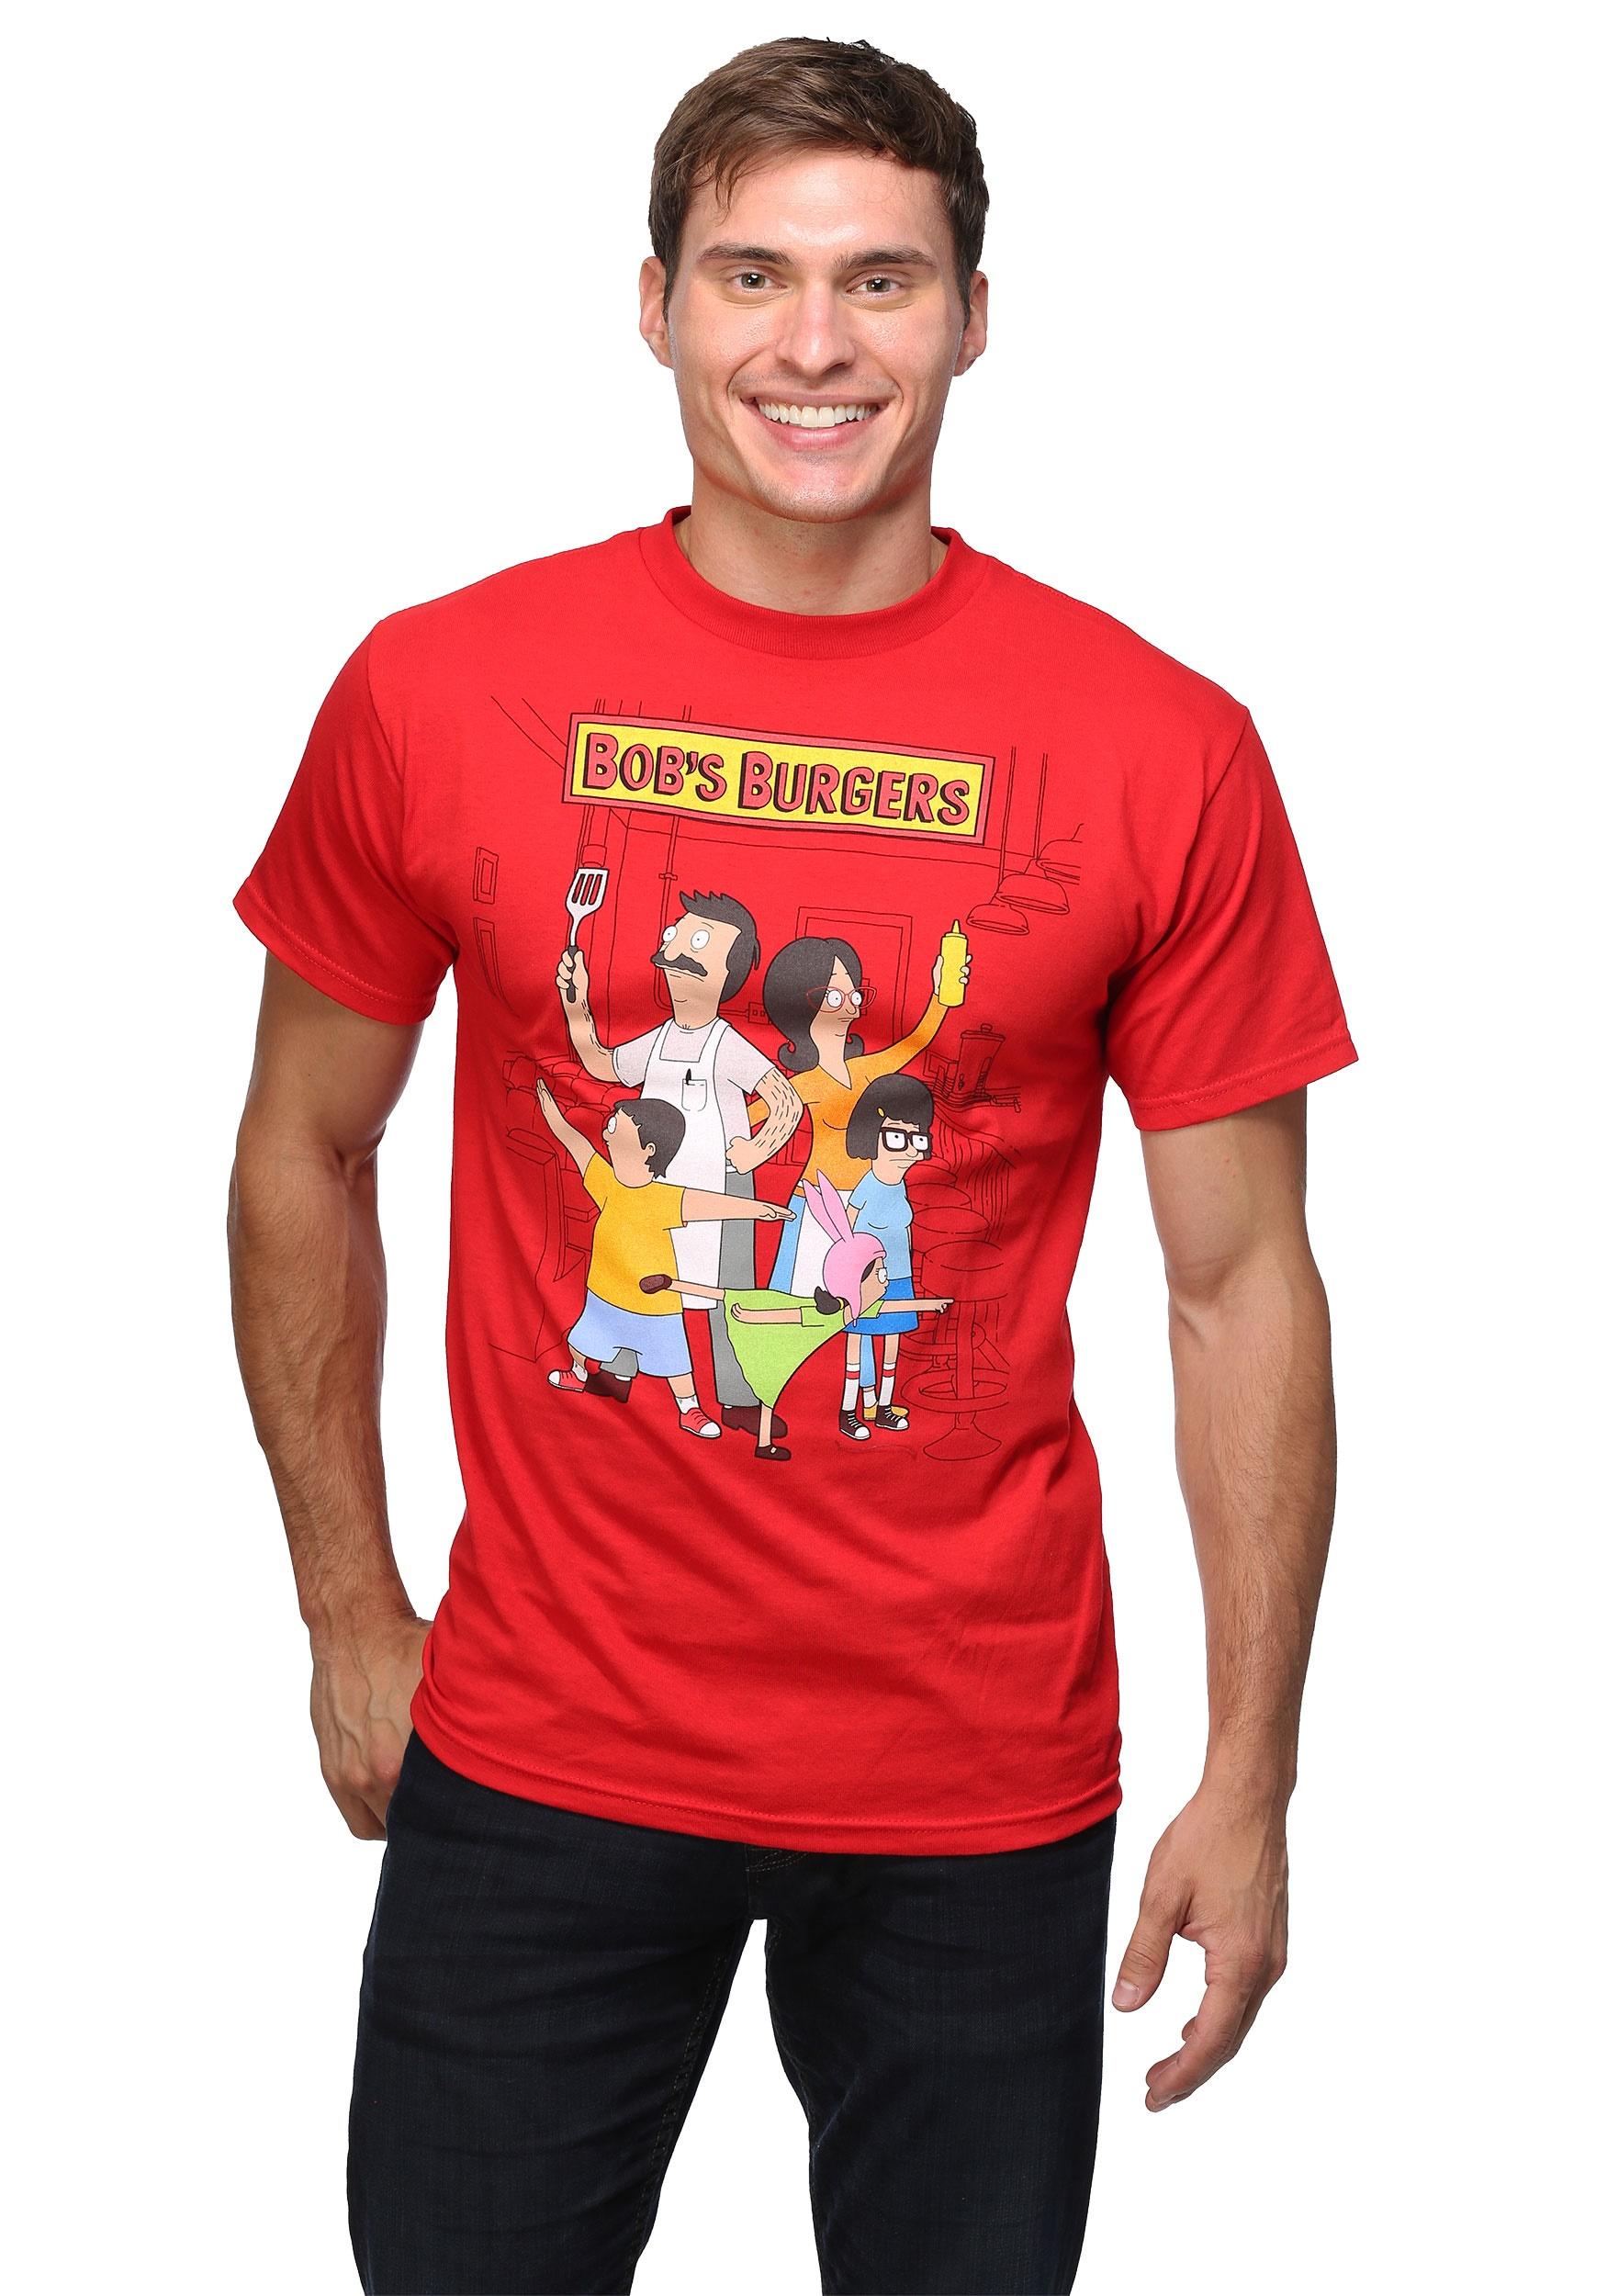 228a7b597 Bob's Burgers Family Portrait 18/1 T-Shirt